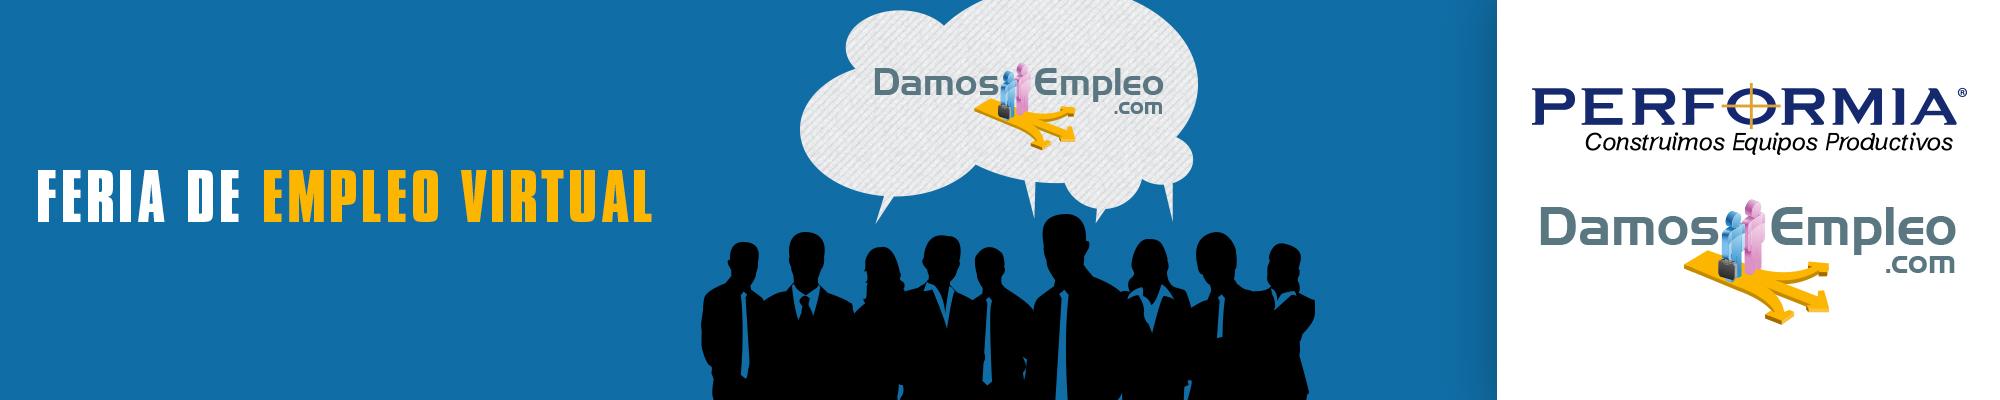 FERIA DE EMPLEO VIRTUAL - DAMOSEMPLEO - EL SALVADOR